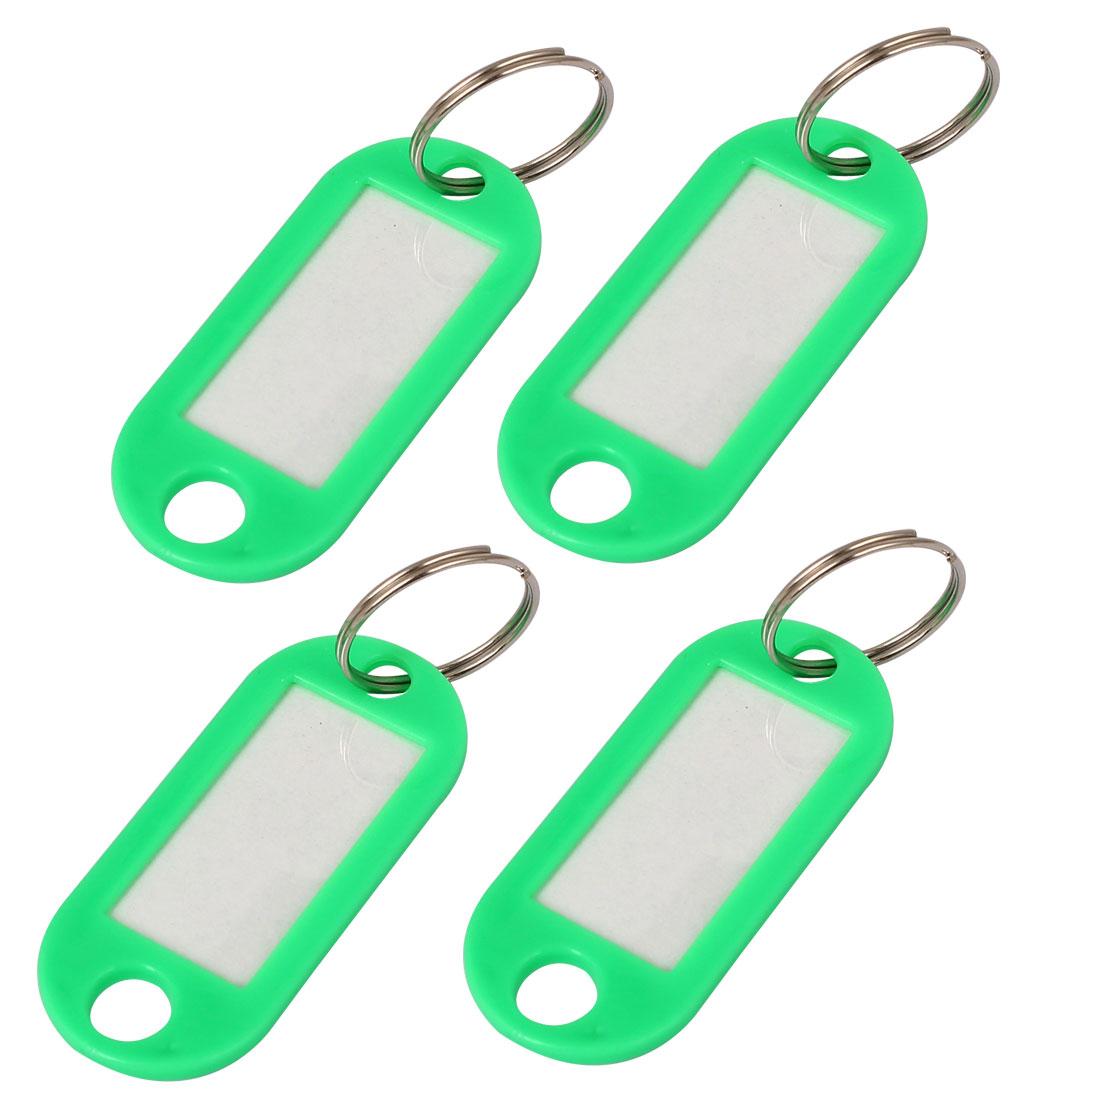 Plastic Key ID Tags Name Card Split Rings Label Keyrings Key Chains Green 4pcs